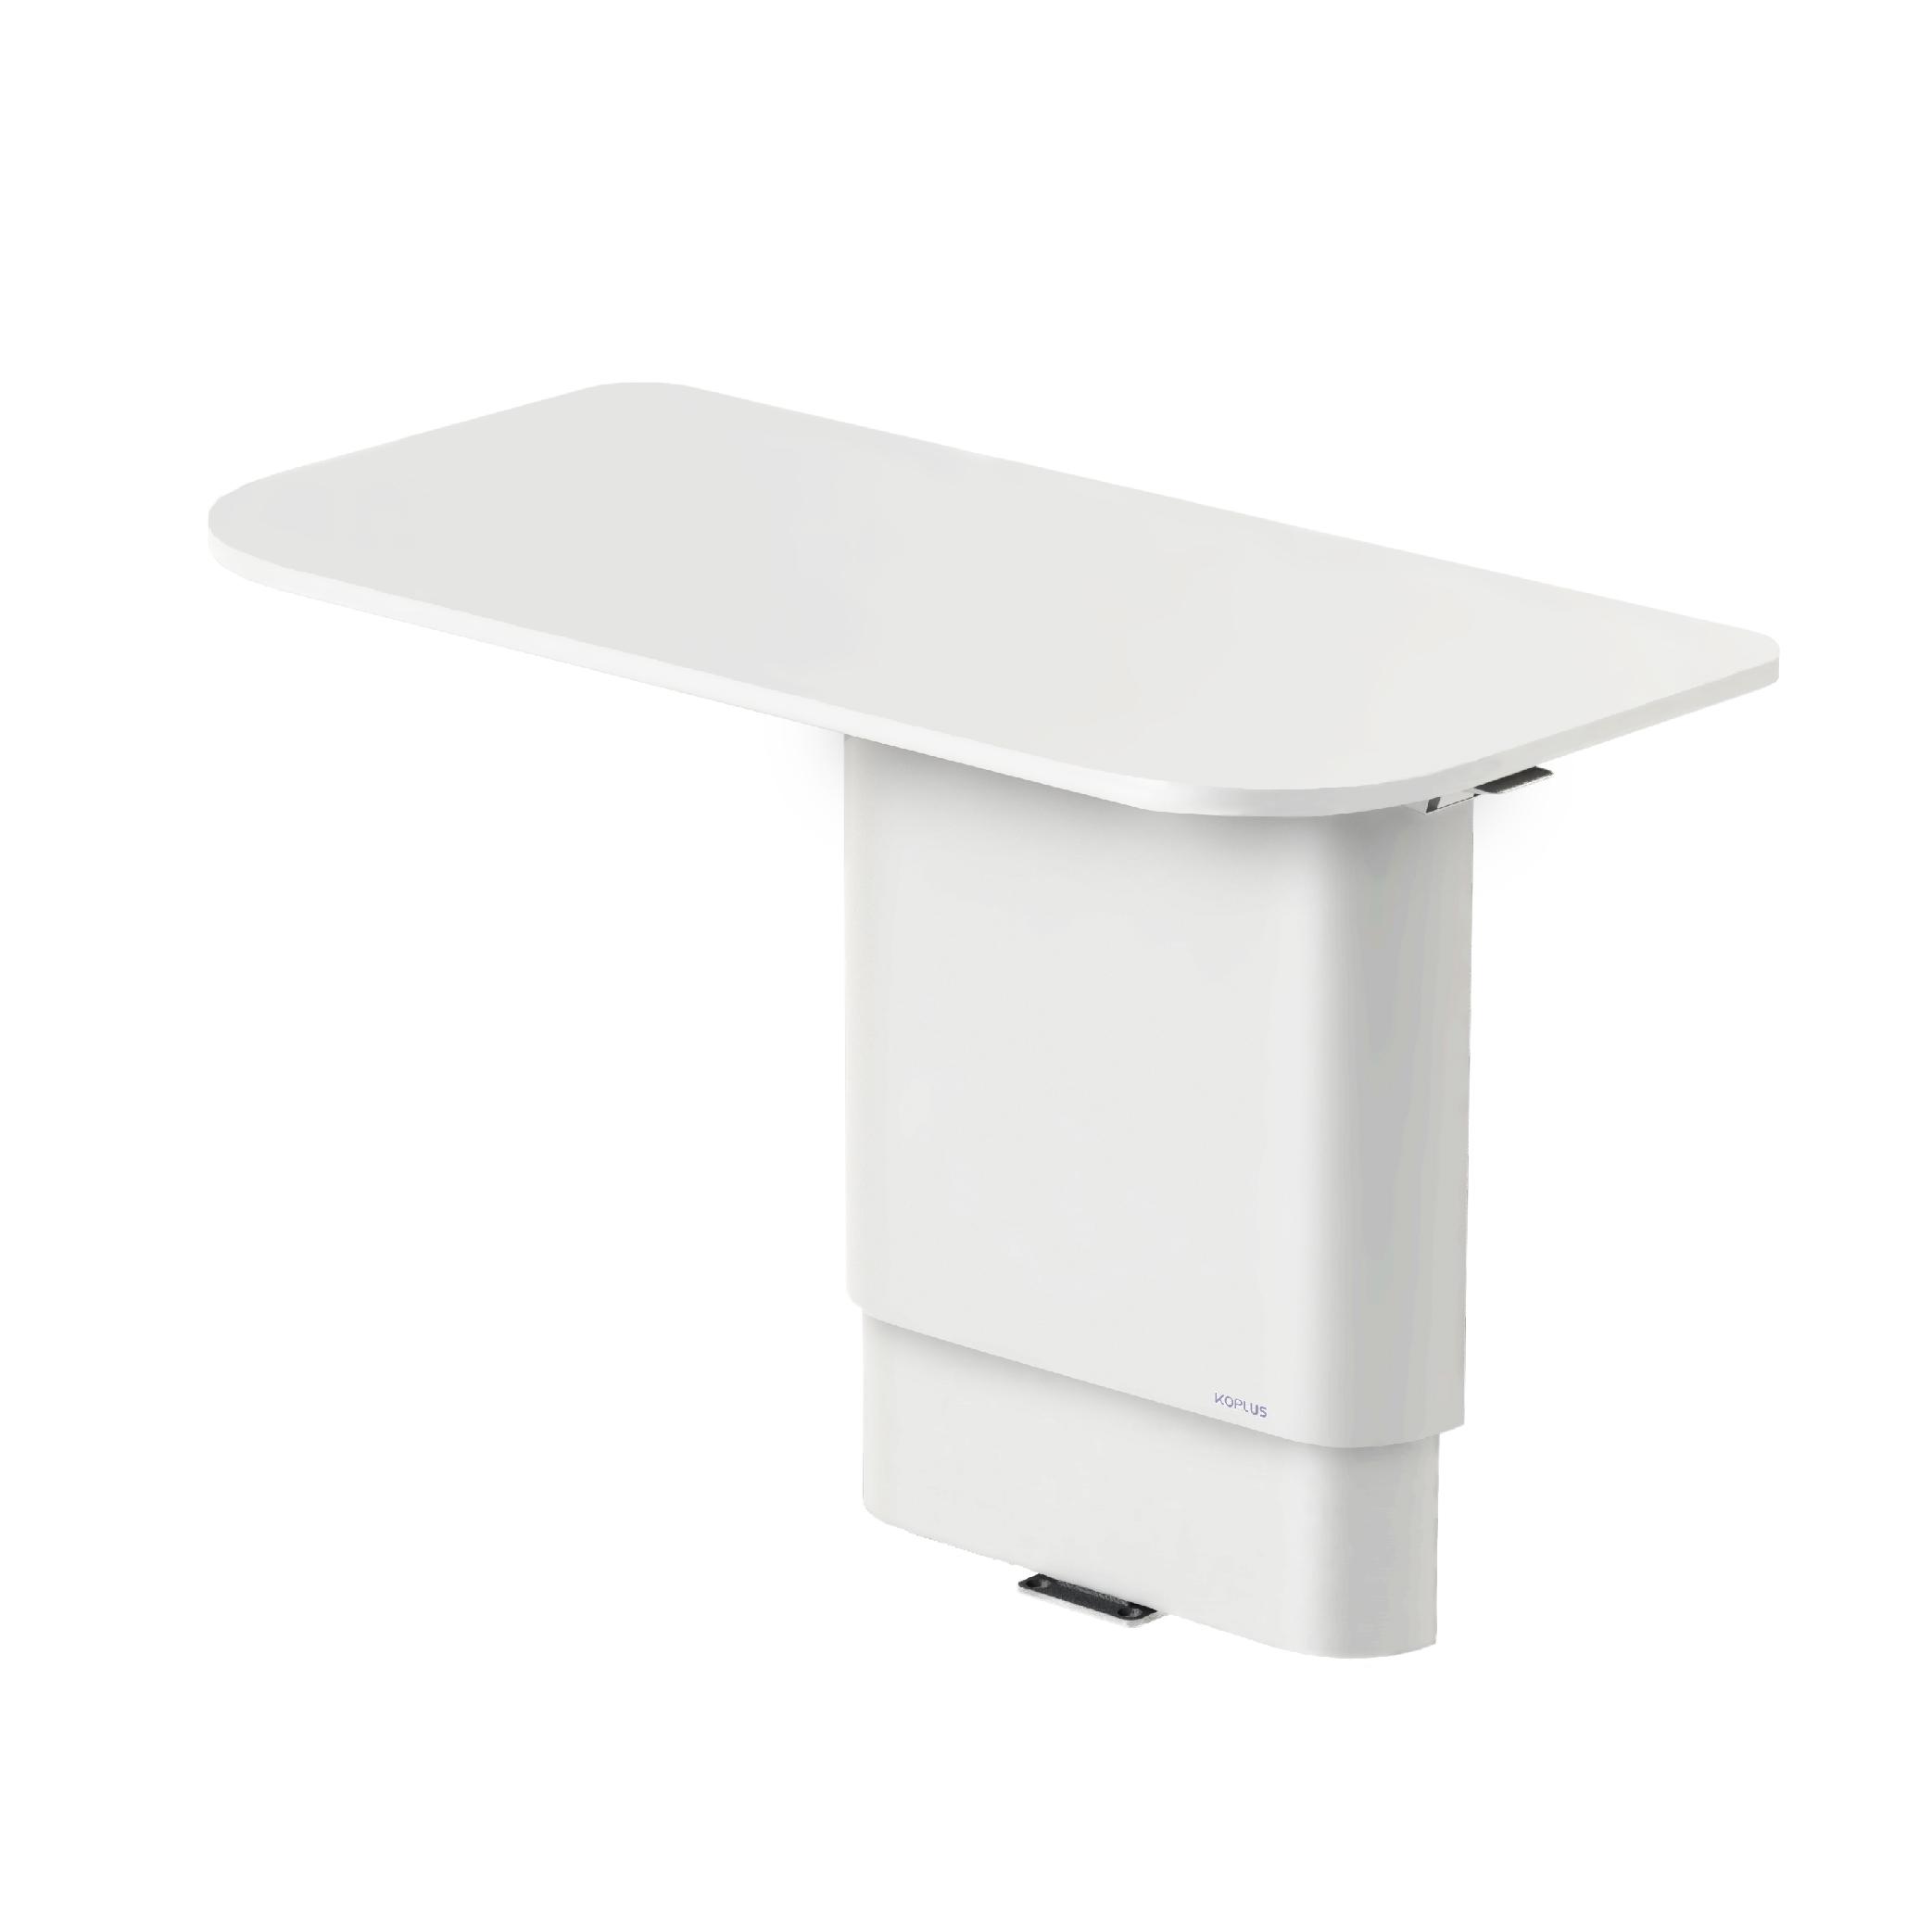 Focus Desk White